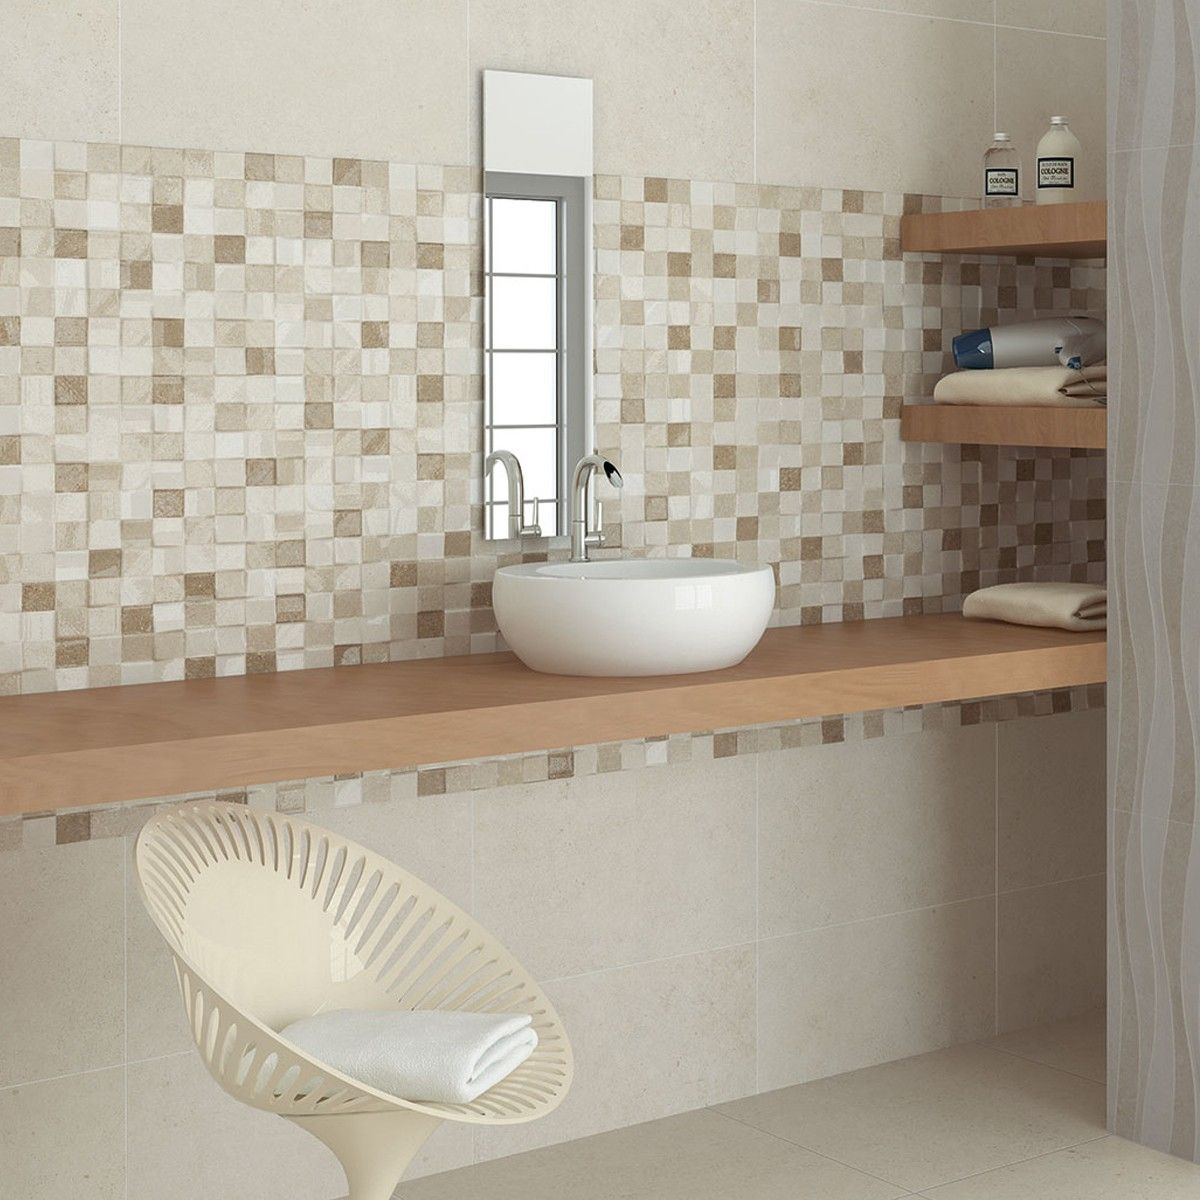 55x33.3 Adelaide Beige Mosaic - Bathroom Wall Tiles - Wall ...